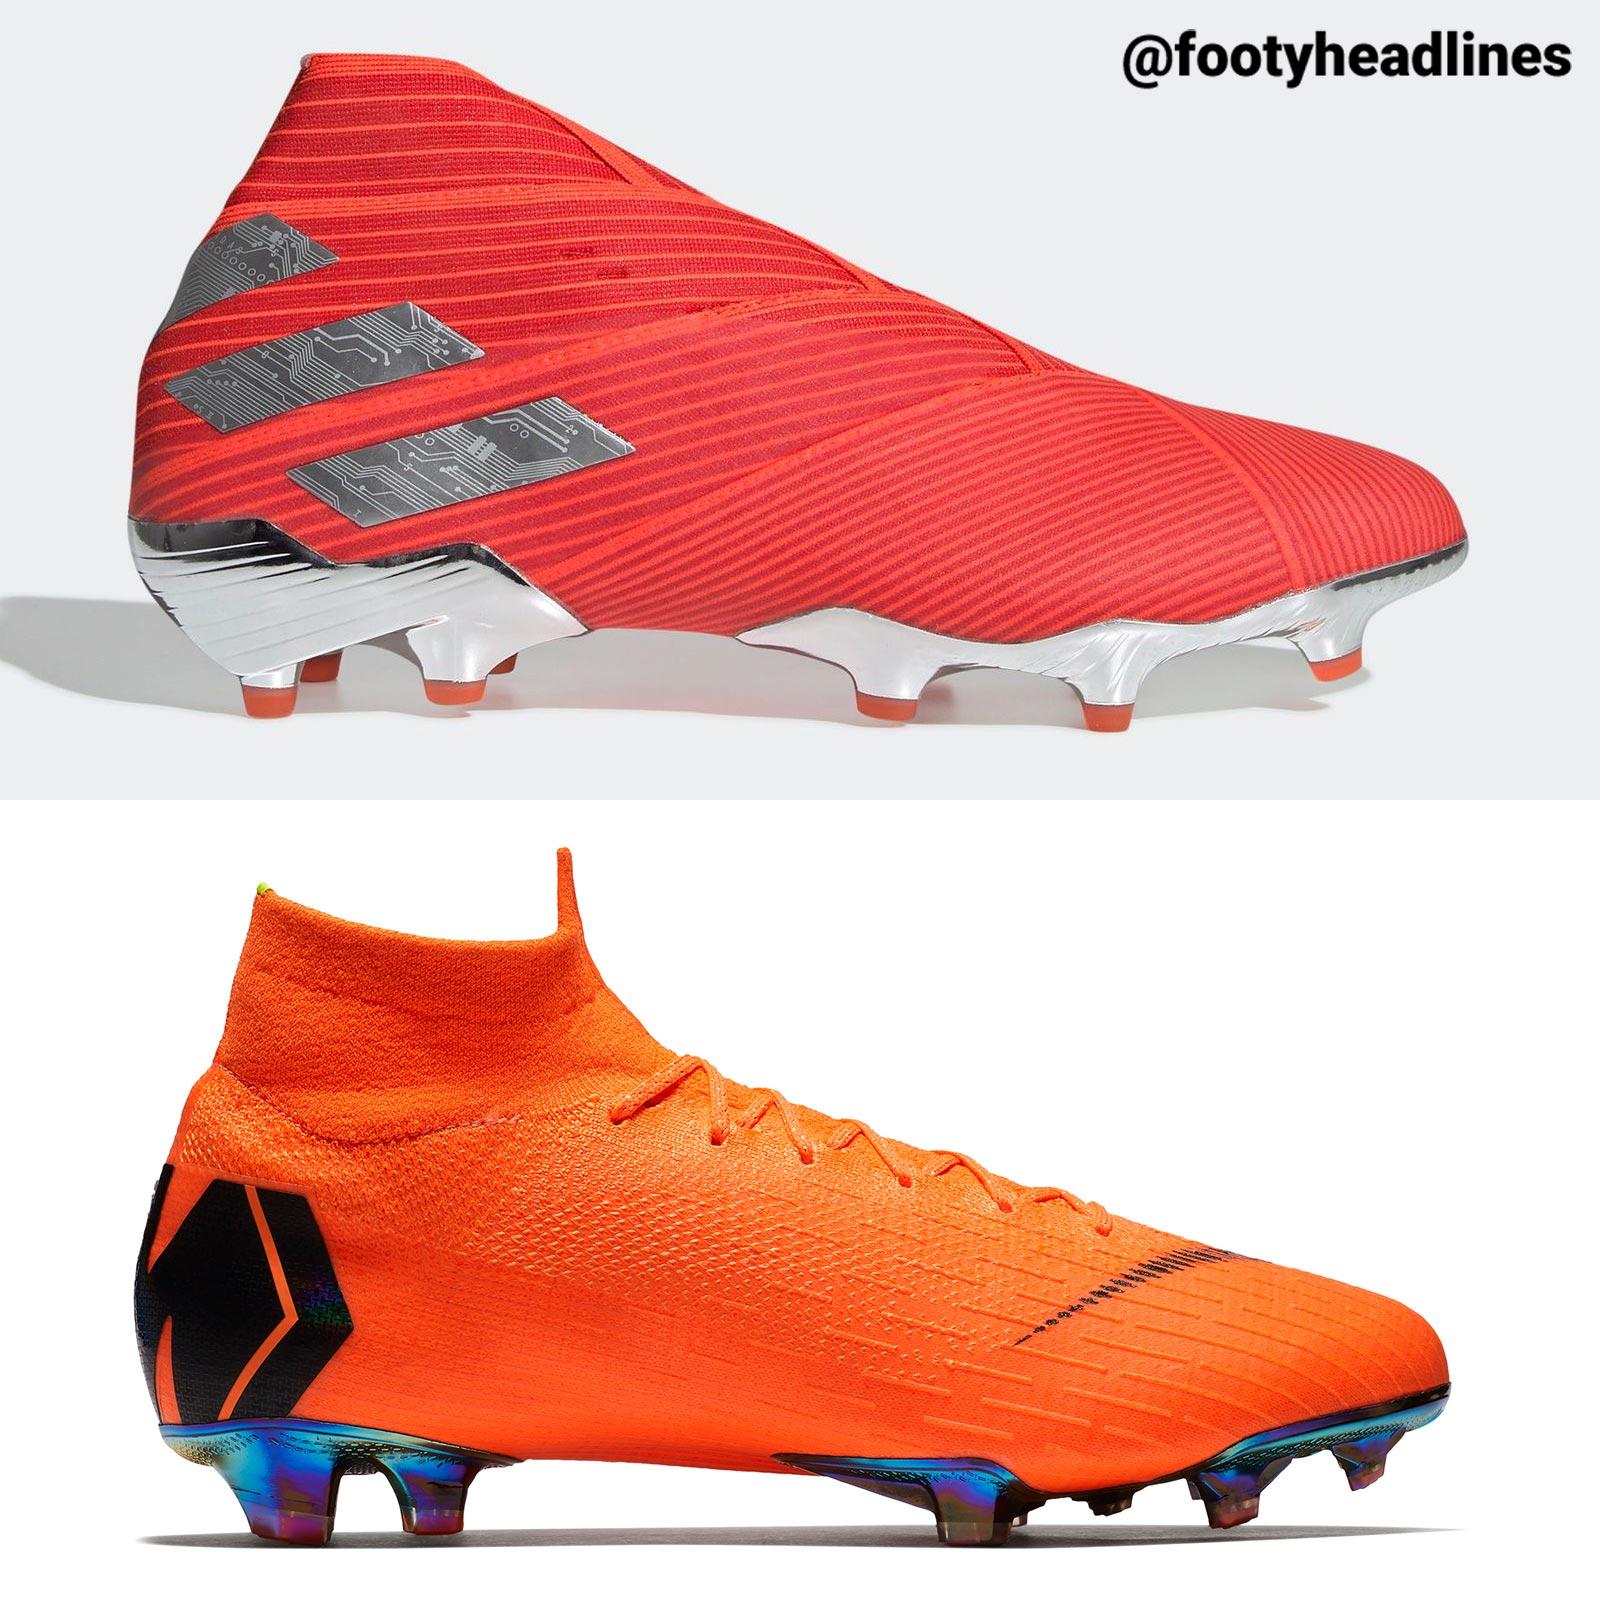 convergencia Crudo puerta  Next-Gen Adidas Nemeziz 19 Two Plate Construction Stolen From Nike Mercurial  360? - Footy Headlines